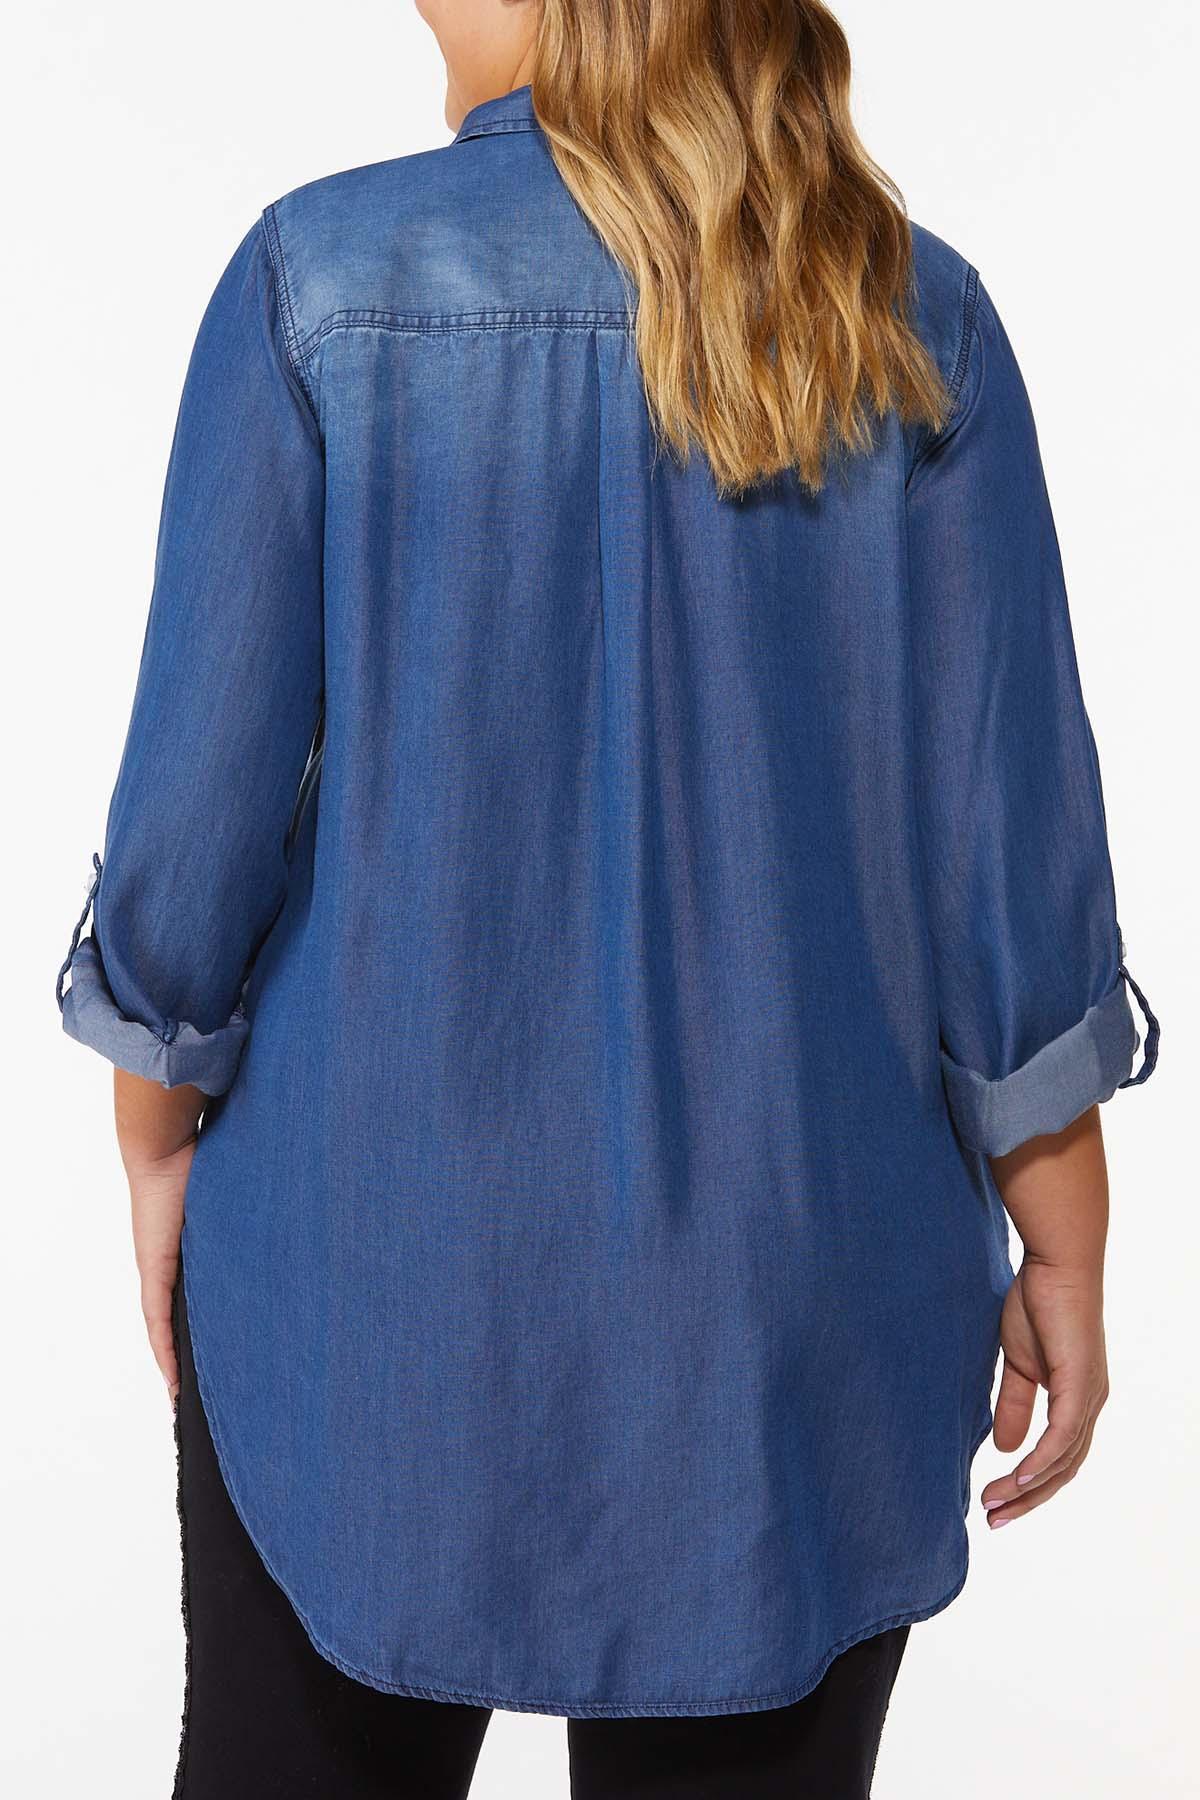 Plus Size Dark Wash Denim Shirt (Item #44667017)